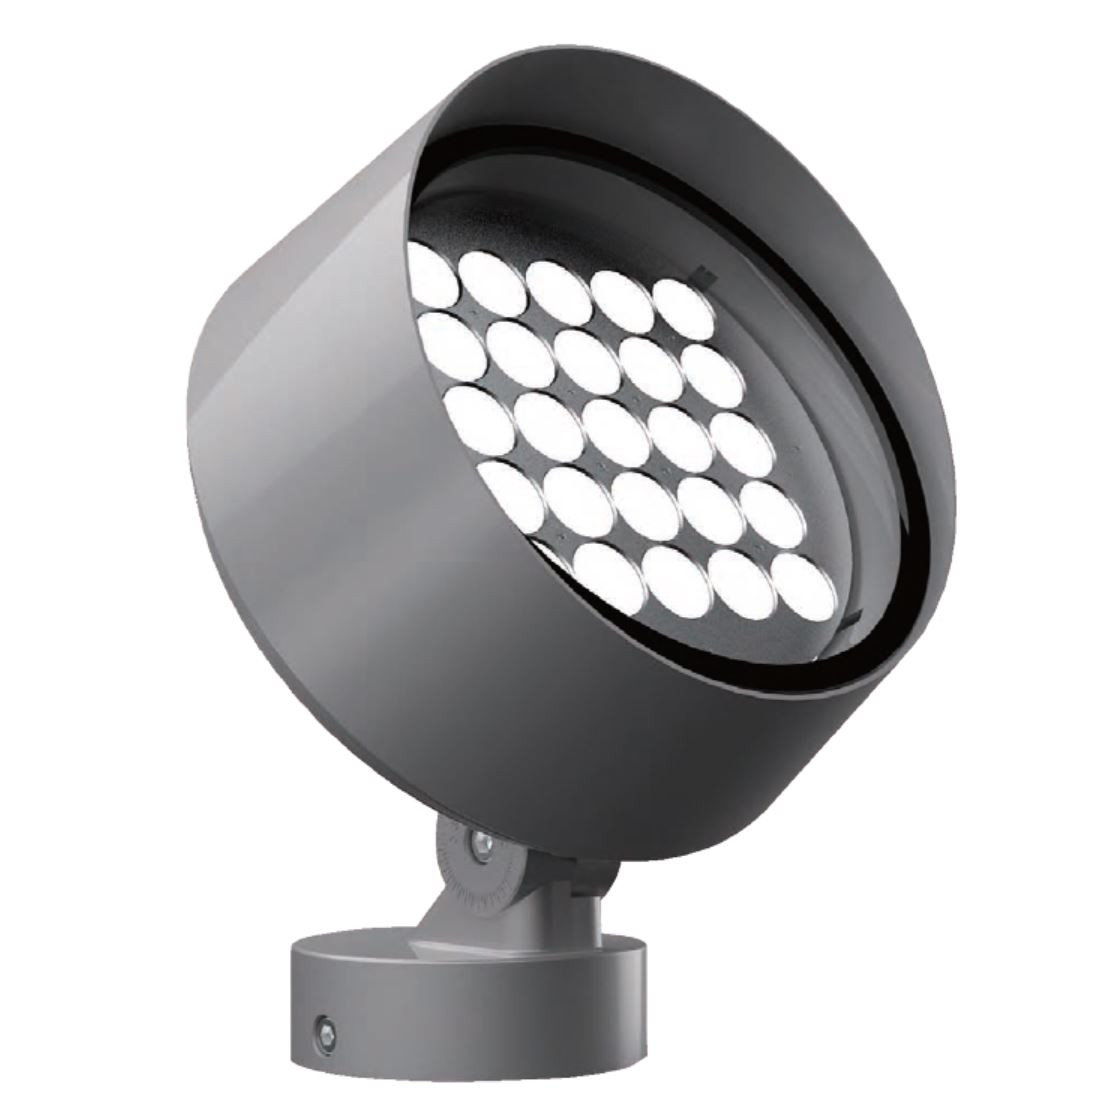 LED Strahler Lora H für Fassadenbeleuchtung